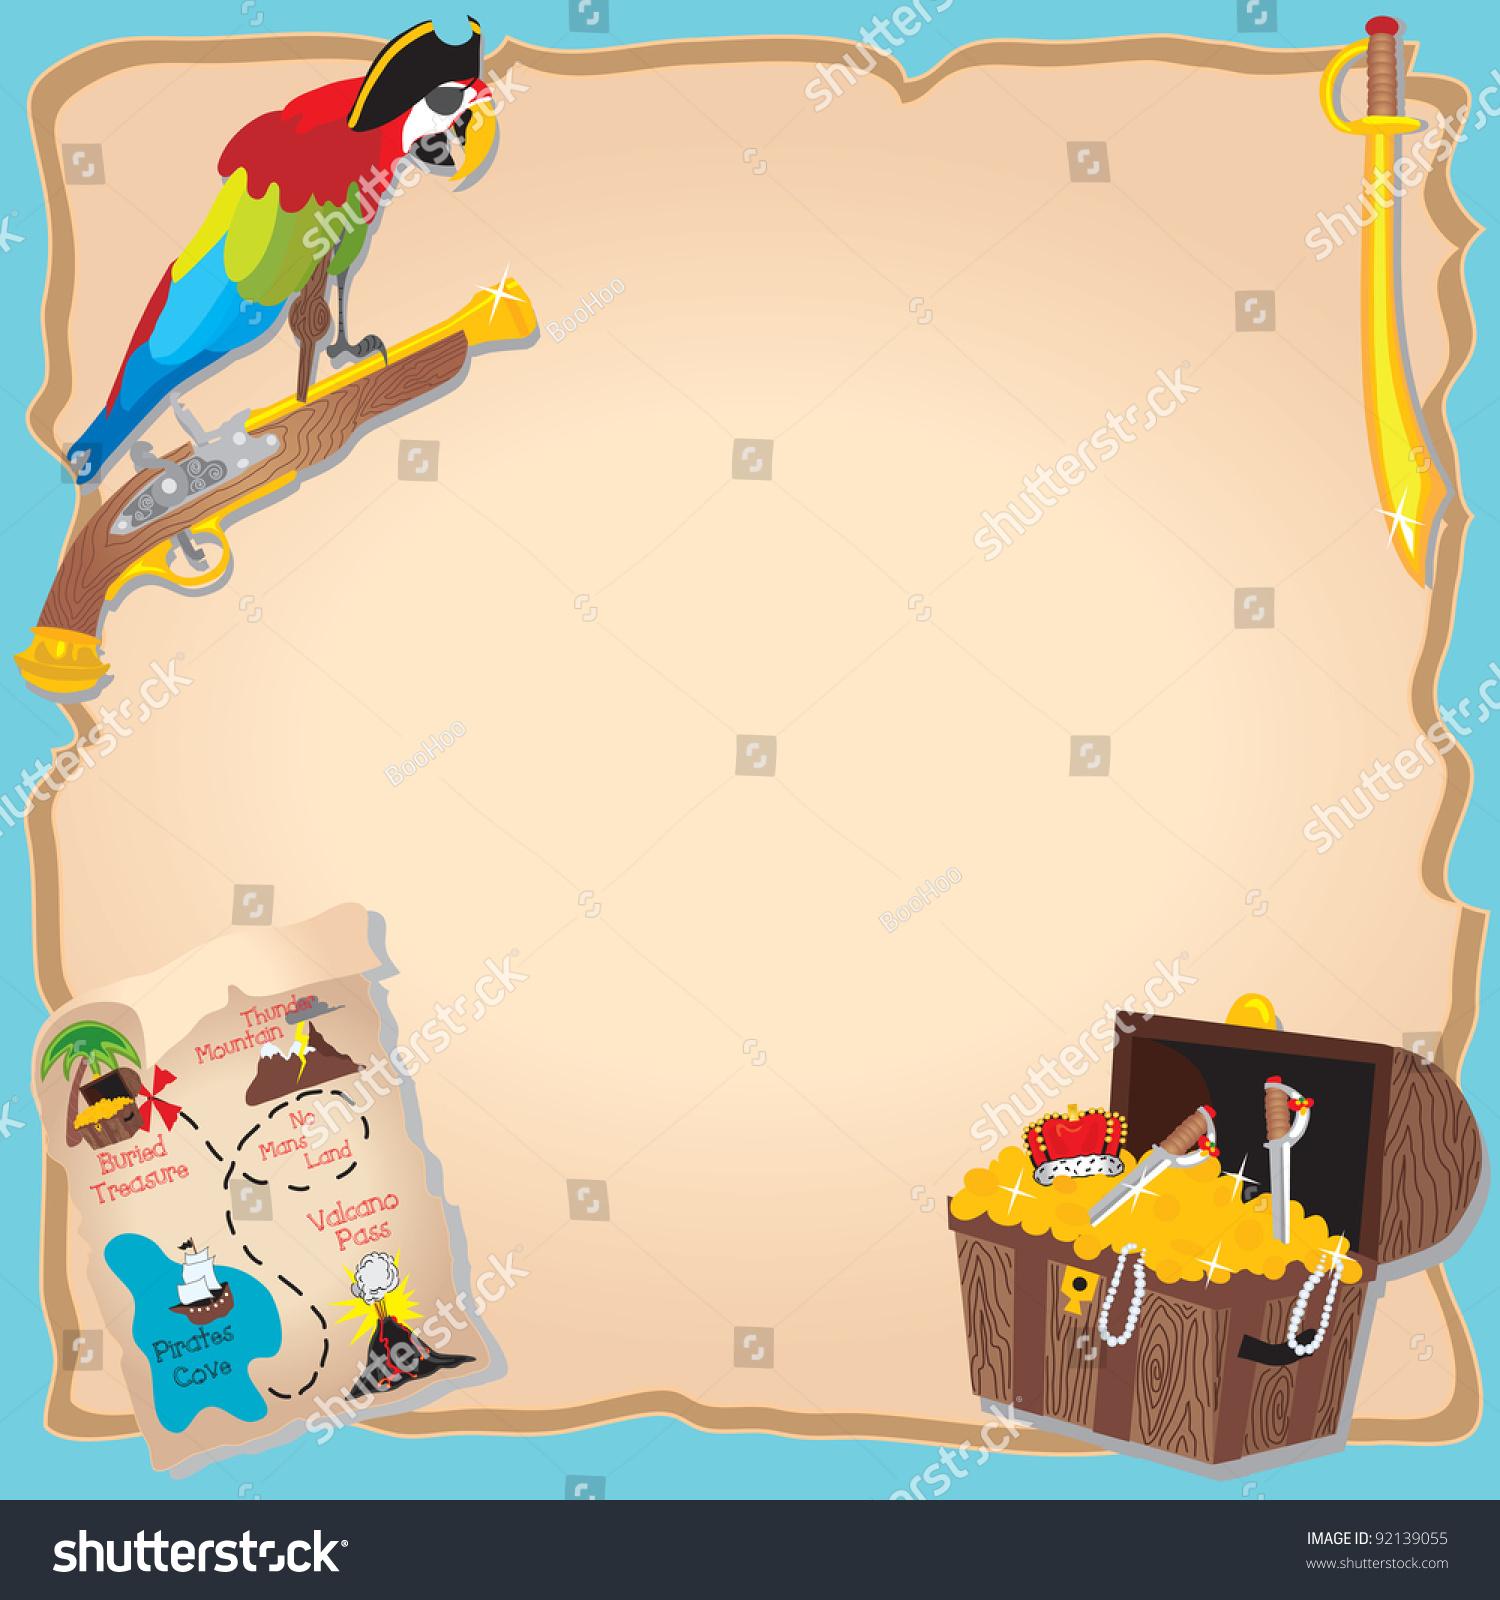 Pirate Birthday Party Treasure Hunt Invitation Stock ...